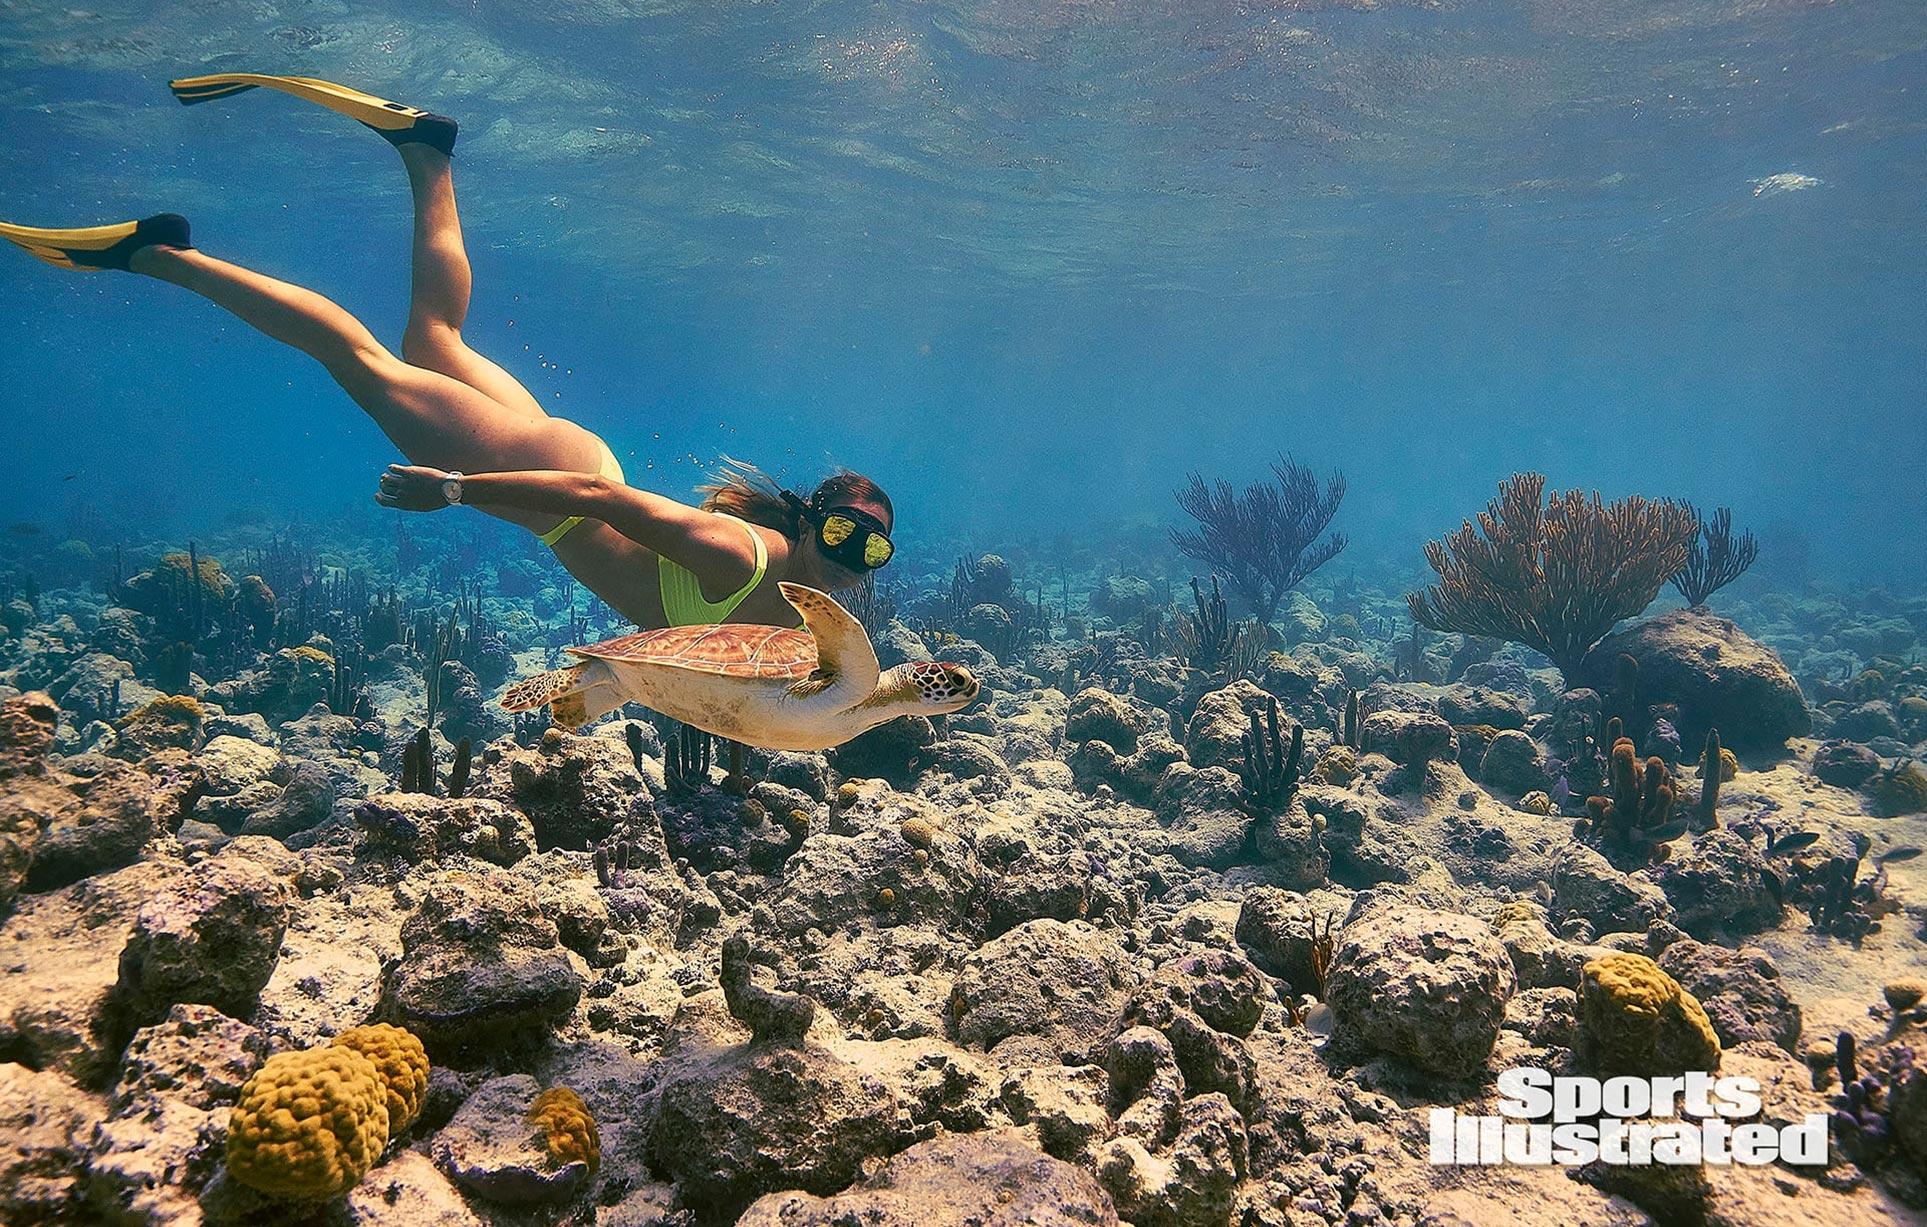 Кортни Конлог в каталоге купальников Sports Illustrated Swimsuit 2020 / фото 01